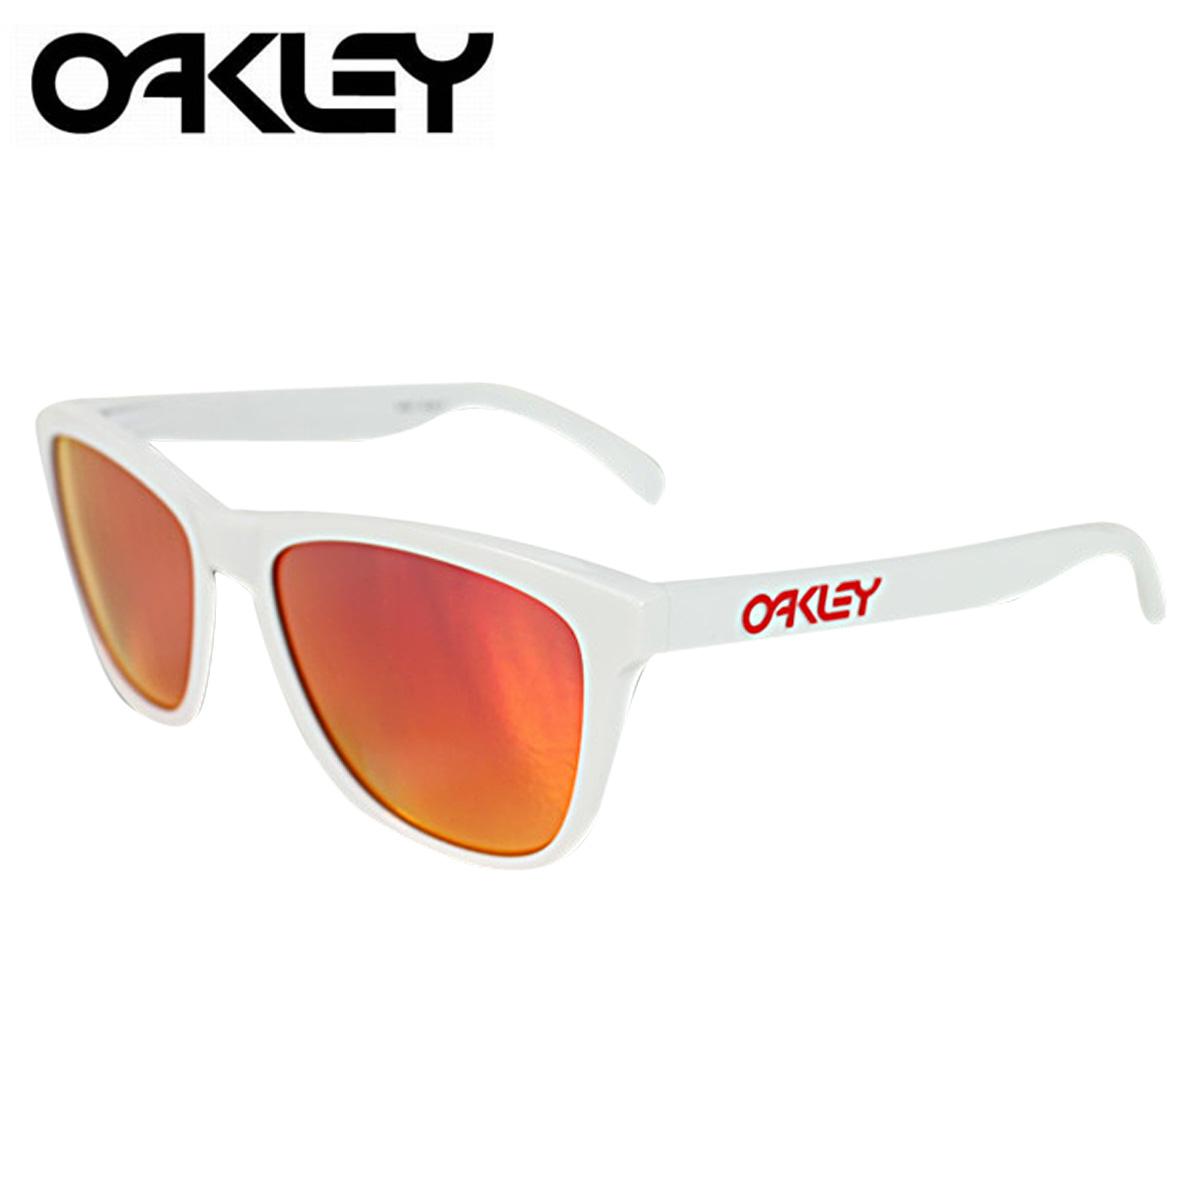 e84ef3a46ae9 ... promo code oakley oakley sunglasses frogskins frog skin mens womens  glasses 24 307 white rudy unisex